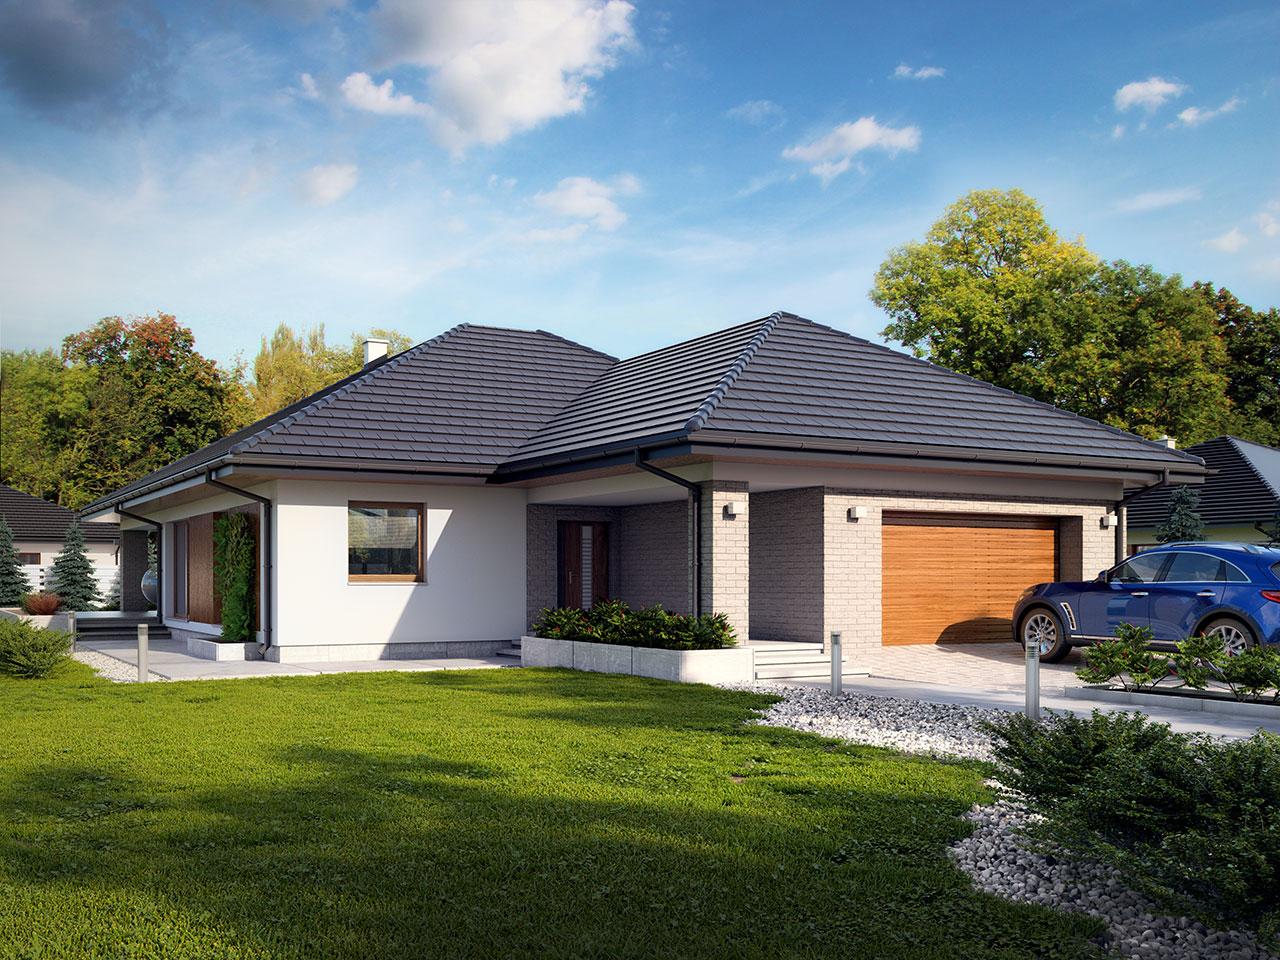 Projekt domu Della (TSL-964) - 164.33m²